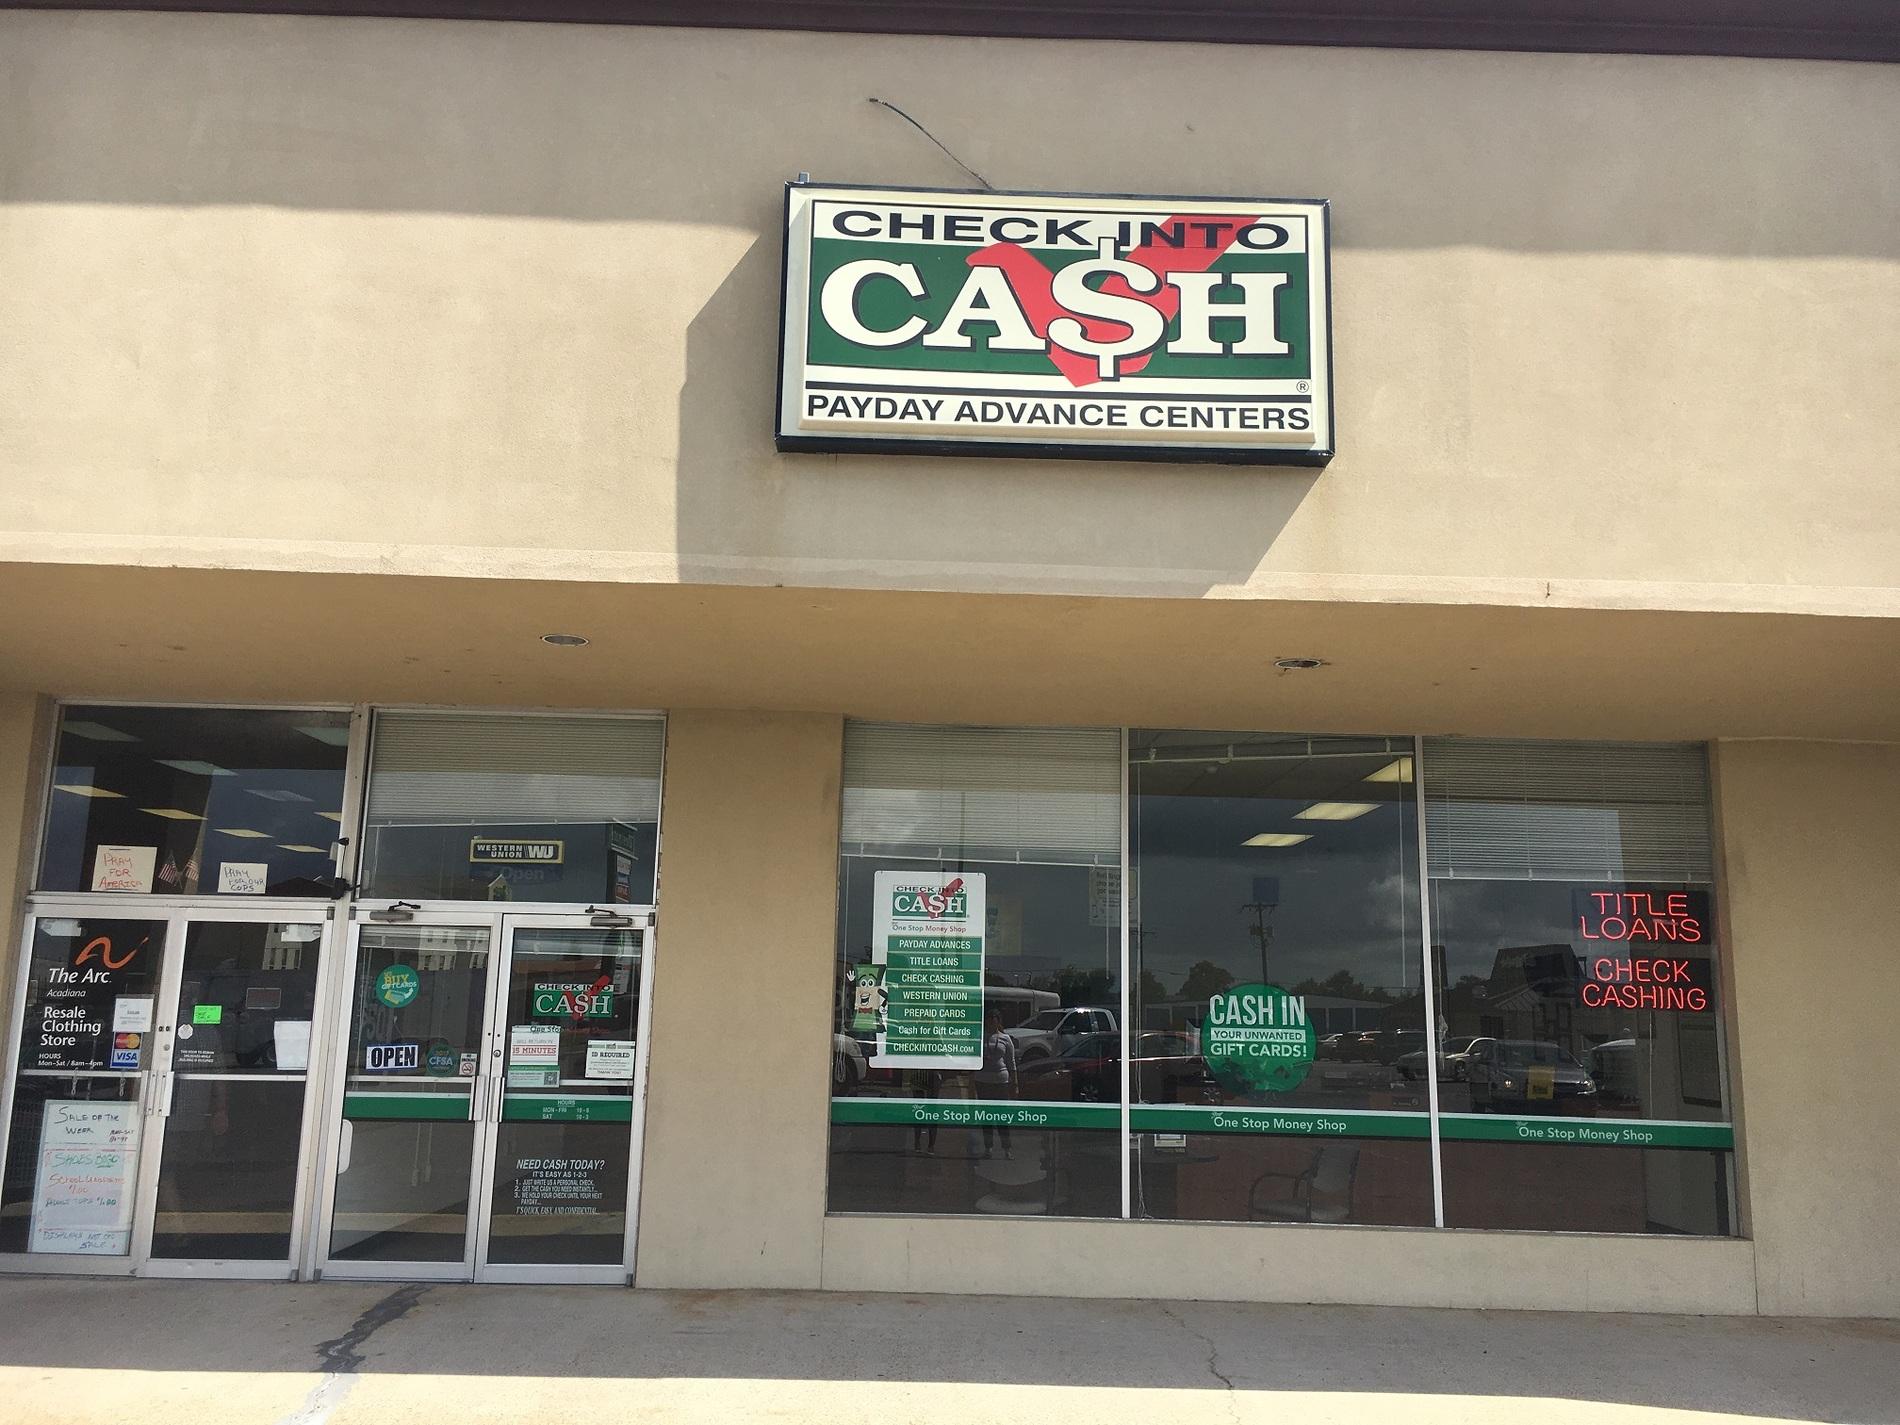 Rapid cash loan rates image 10